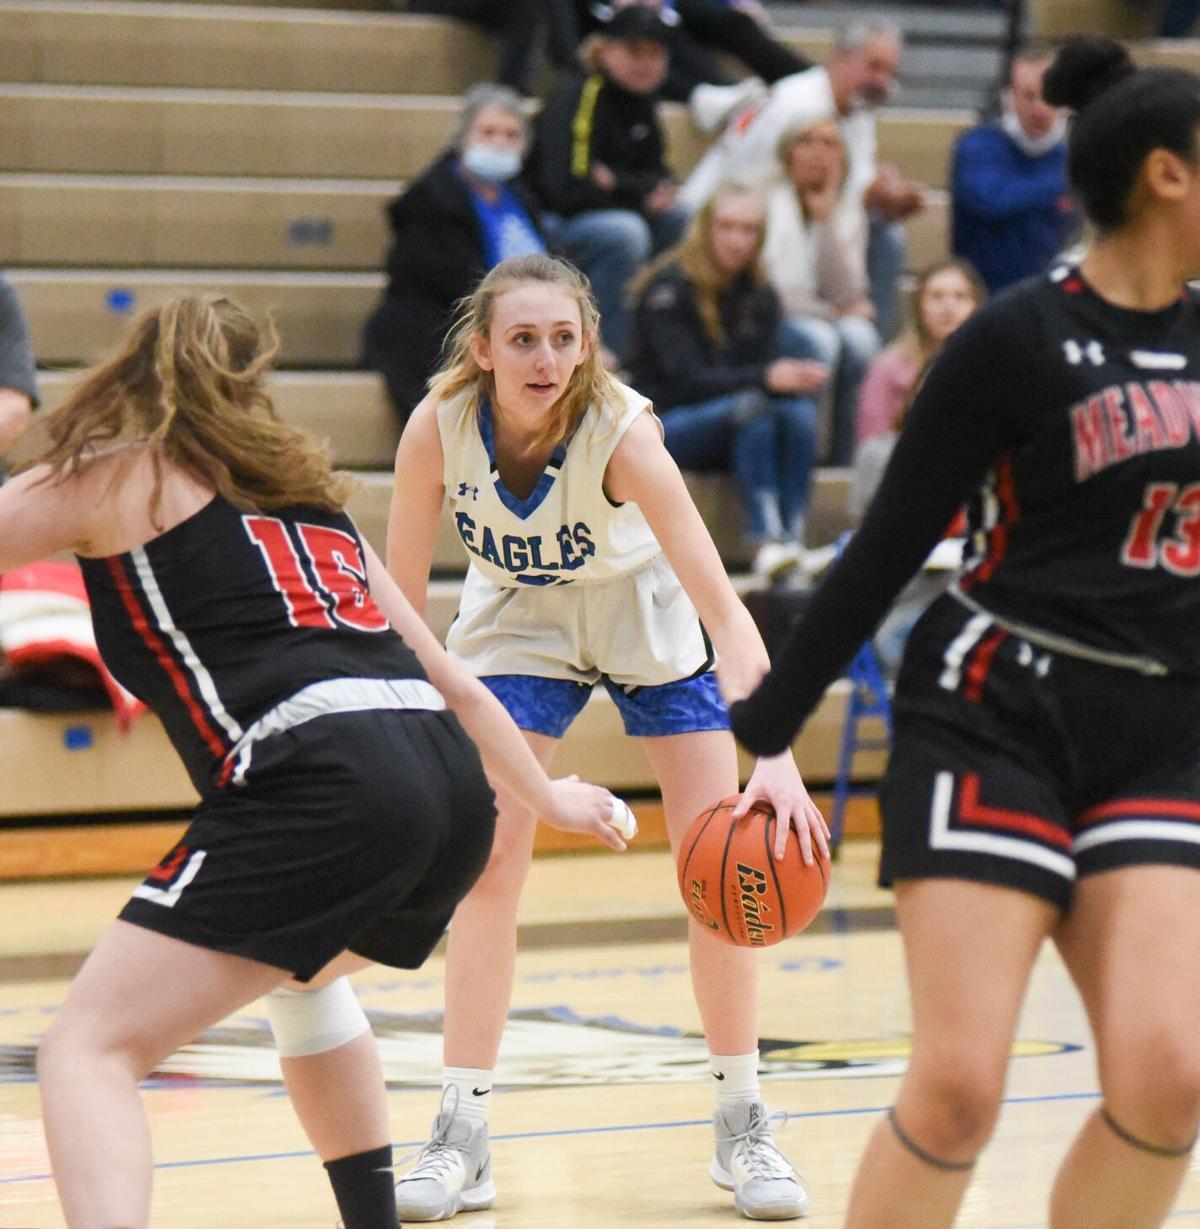 Girls Basketball - MASH vs. CASH